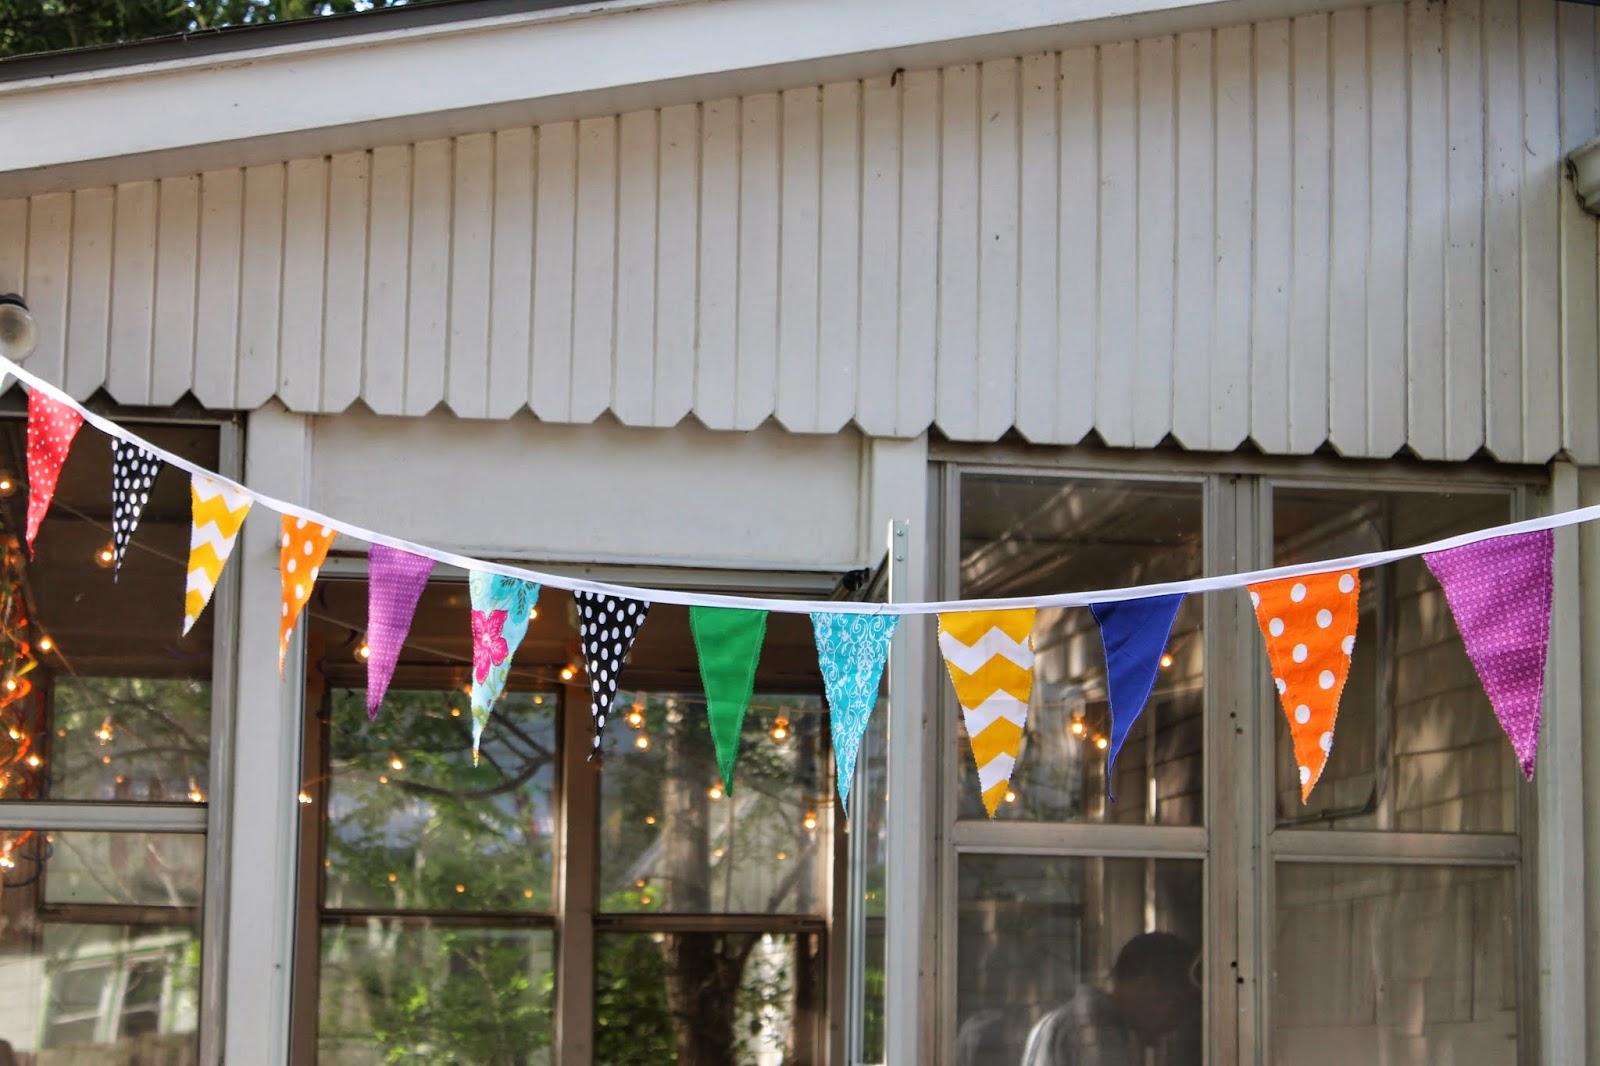 summertime party decor, DIY bunting, backyard party decor, fabric bunting